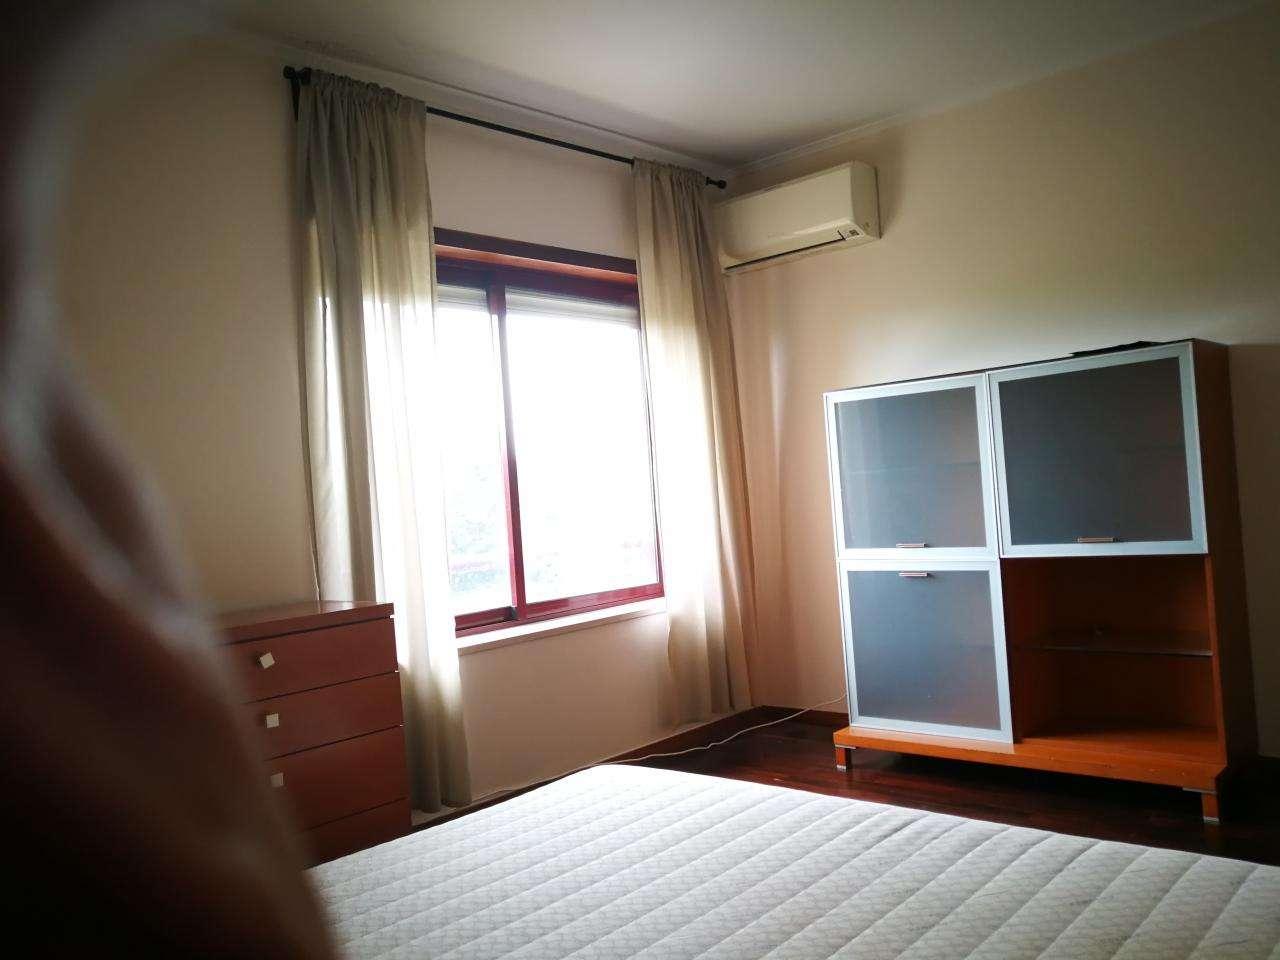 Apartamento para comprar, Marvila, Lisboa - Foto 16